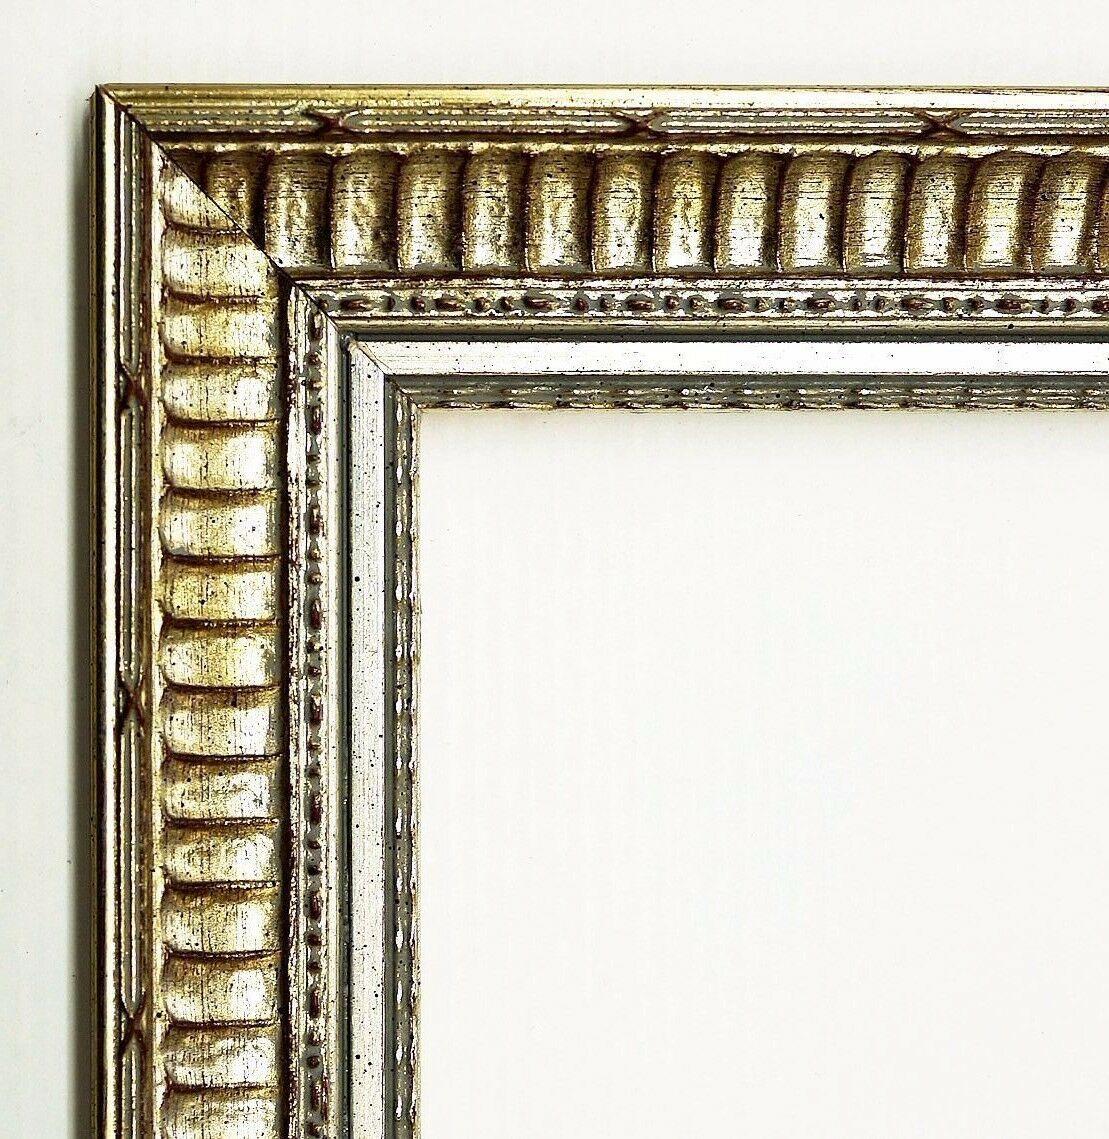 bilderrahmen silber barock rahmen holz antik clever line 1 3, 8